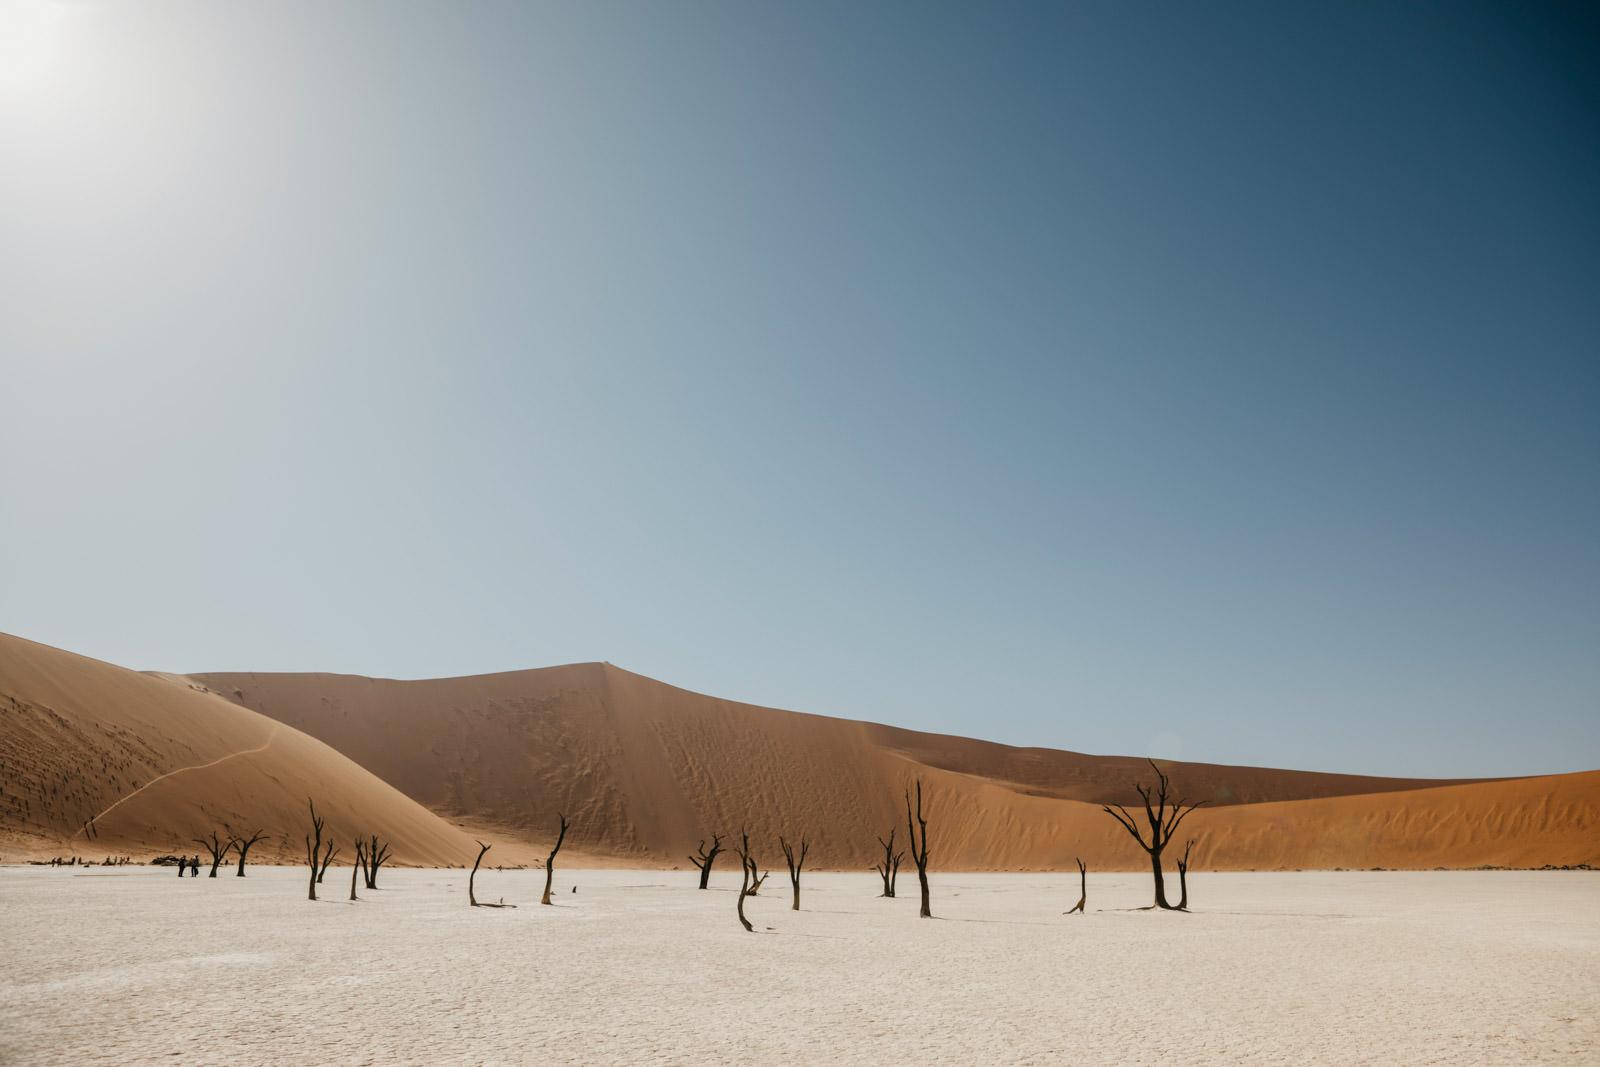 namibia_trip_rooftent_camping_roadtrip (22 von 26).jpg